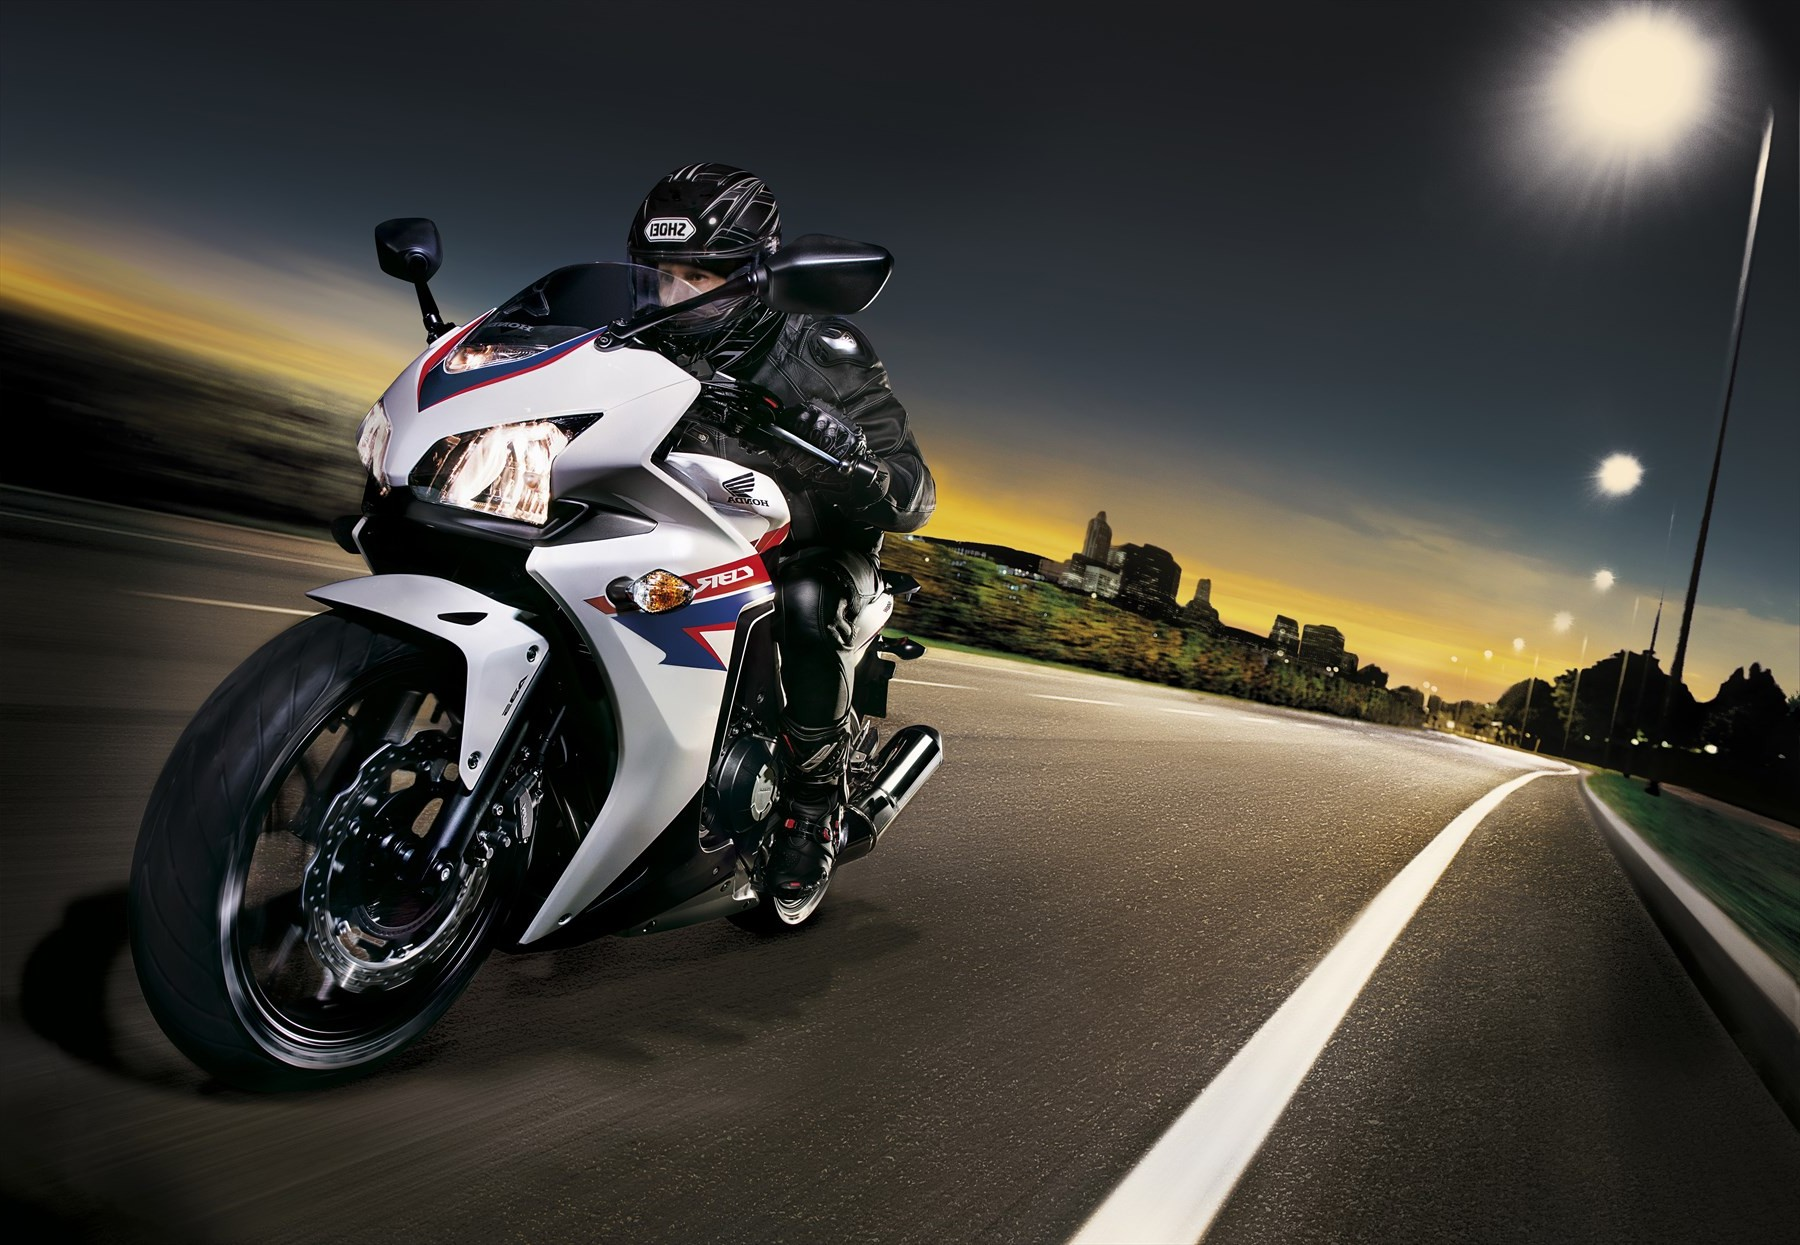 Honda CBR500R (Photo: Quickpic)